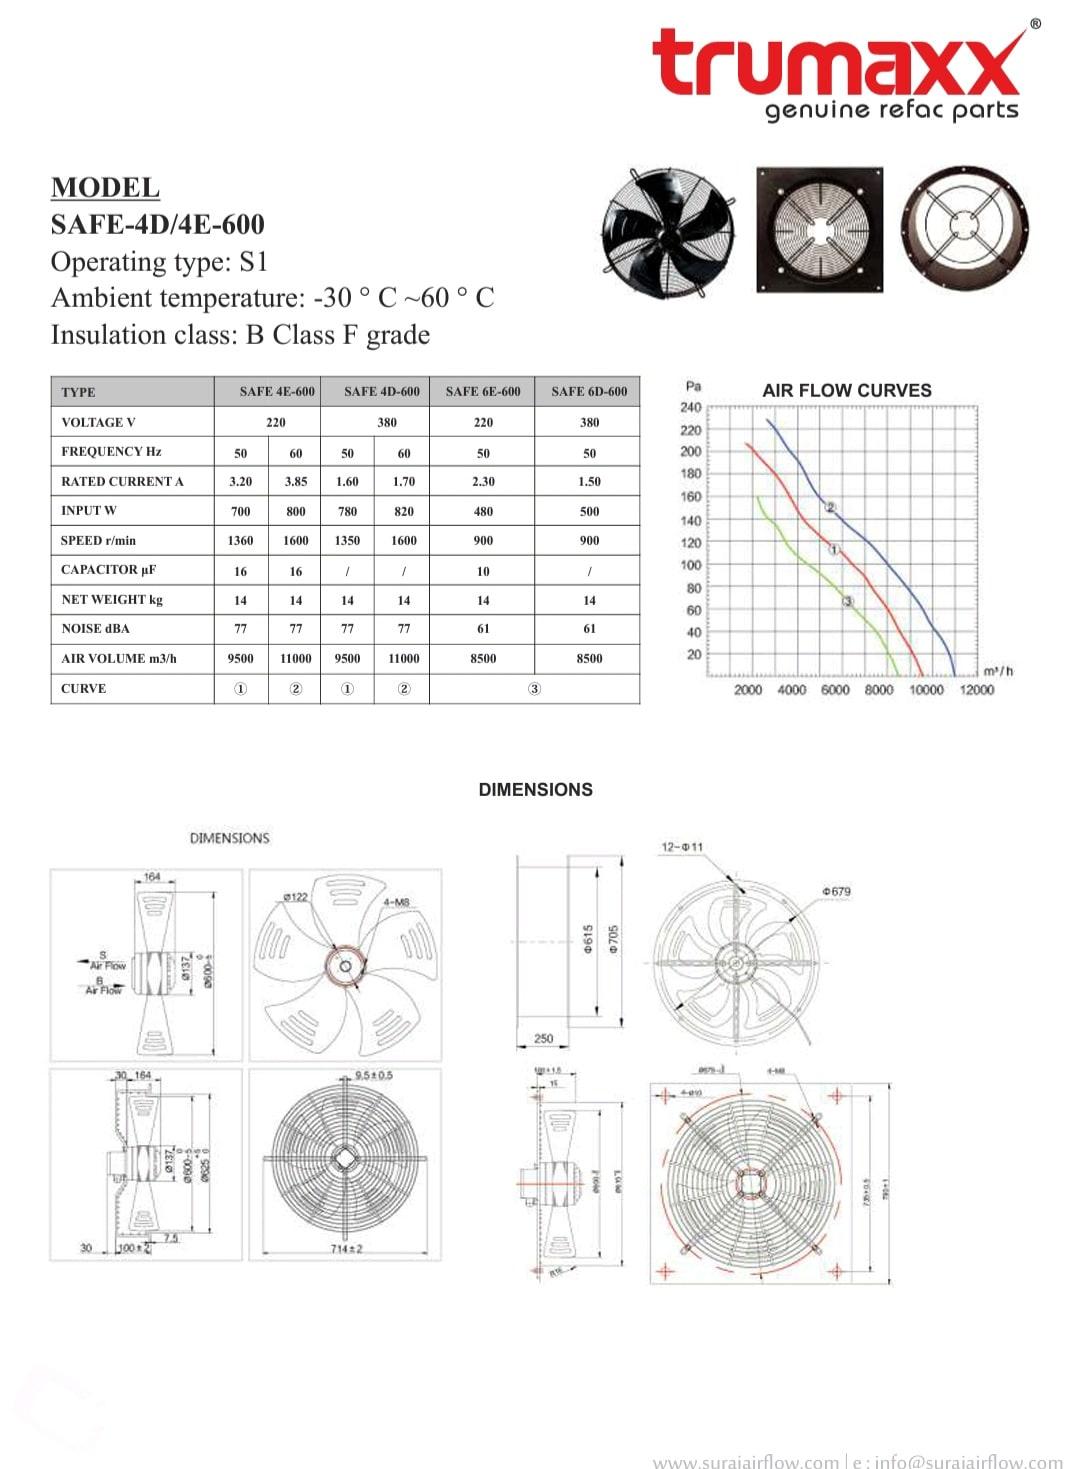 TRUMAXX AXIAL FAN (4E 600 S) (24')